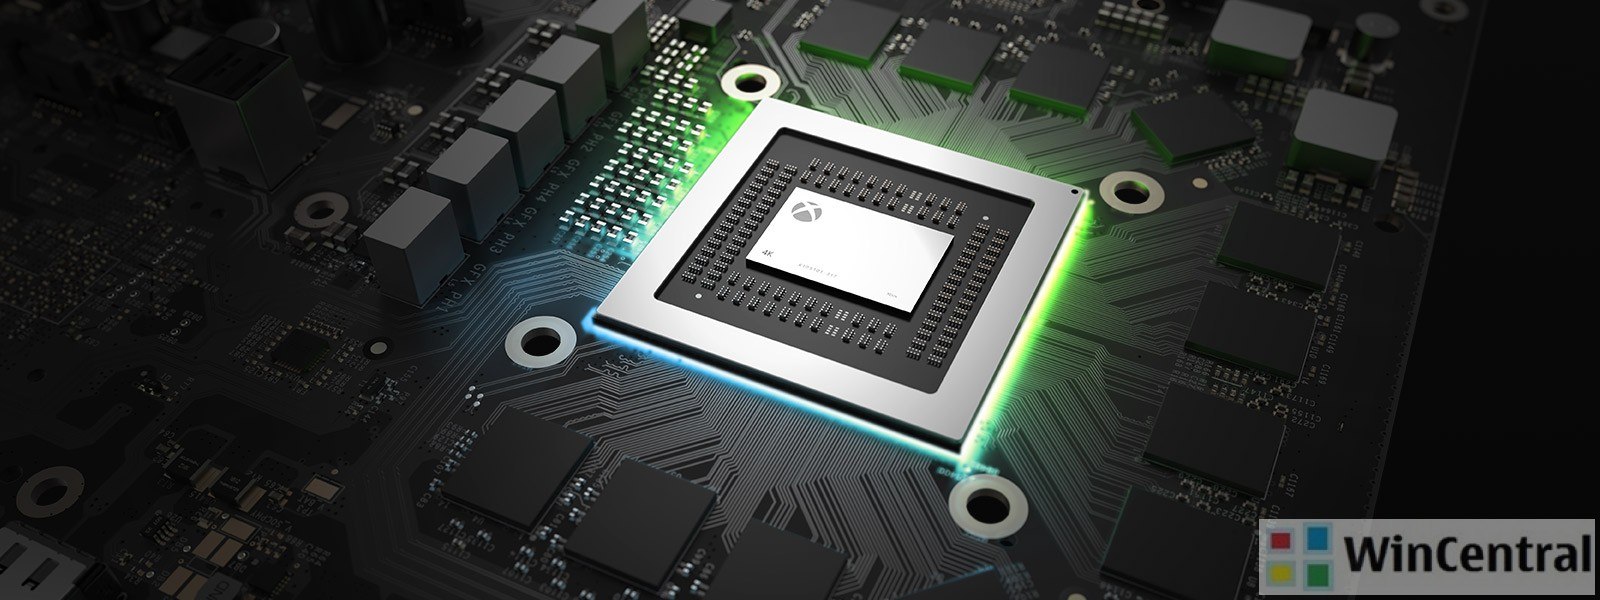 Scorpio Engine in Xbox One X